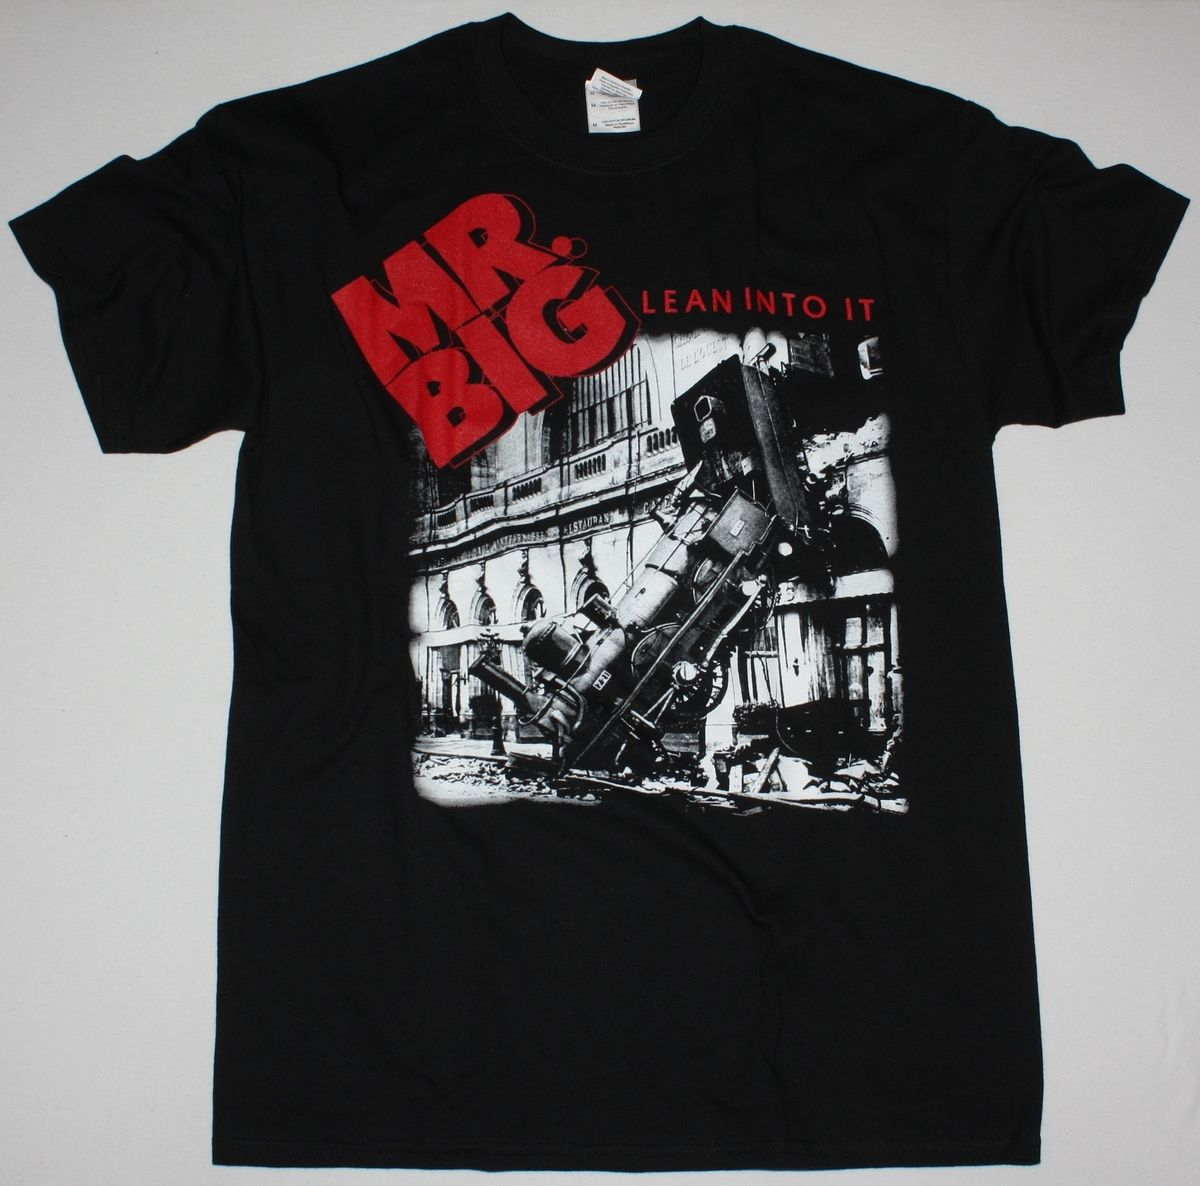 MR BIG LEAN INTO IT HARD ROCK BAND EXTREME IMPELLITTERI NEW BLACK T-SHIRT